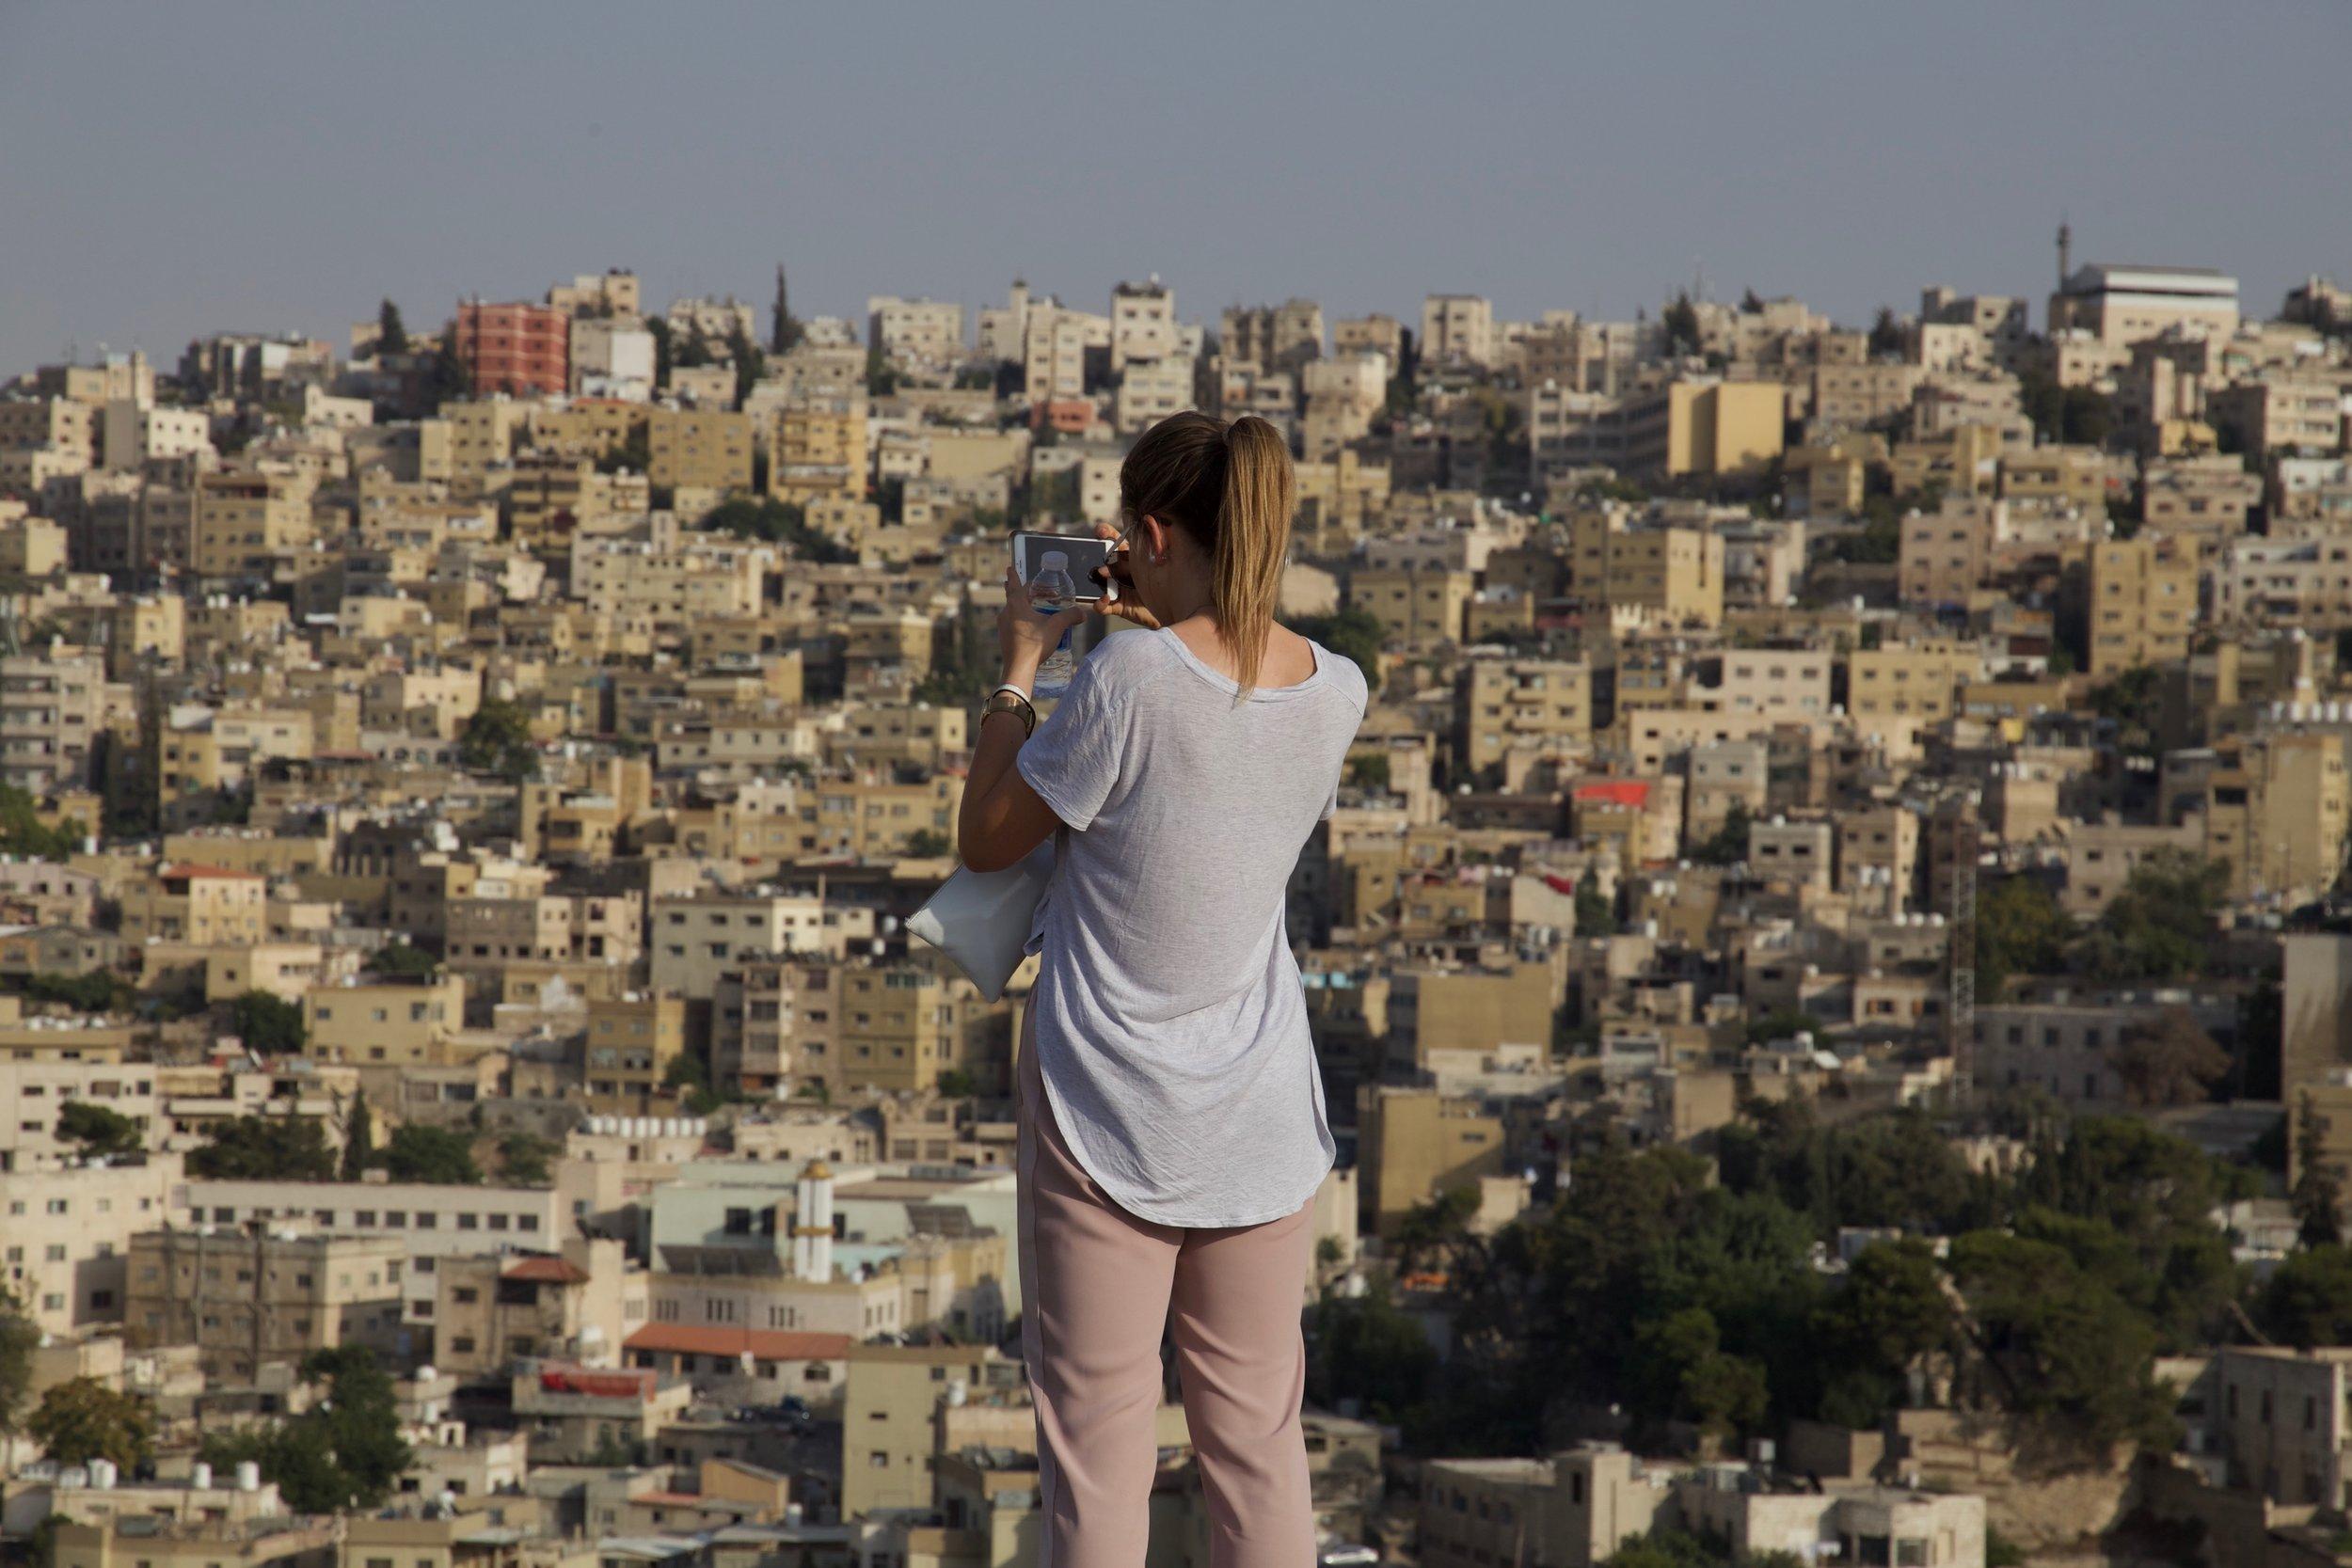 Amman, Jordan عمان، الأردن